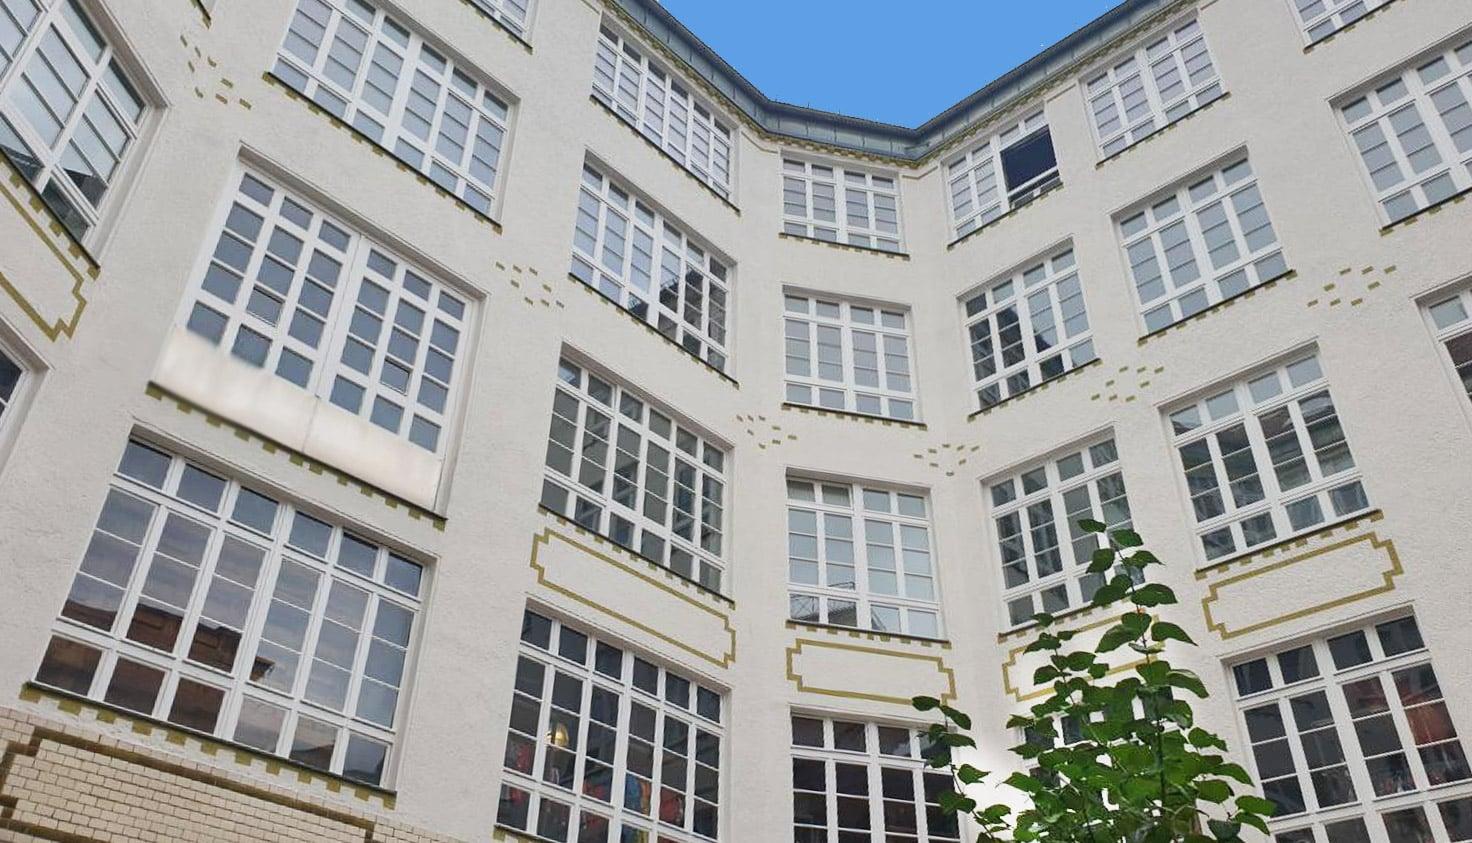 08-Fassade-referenz-malerbetrieb-kluge-berlin-1